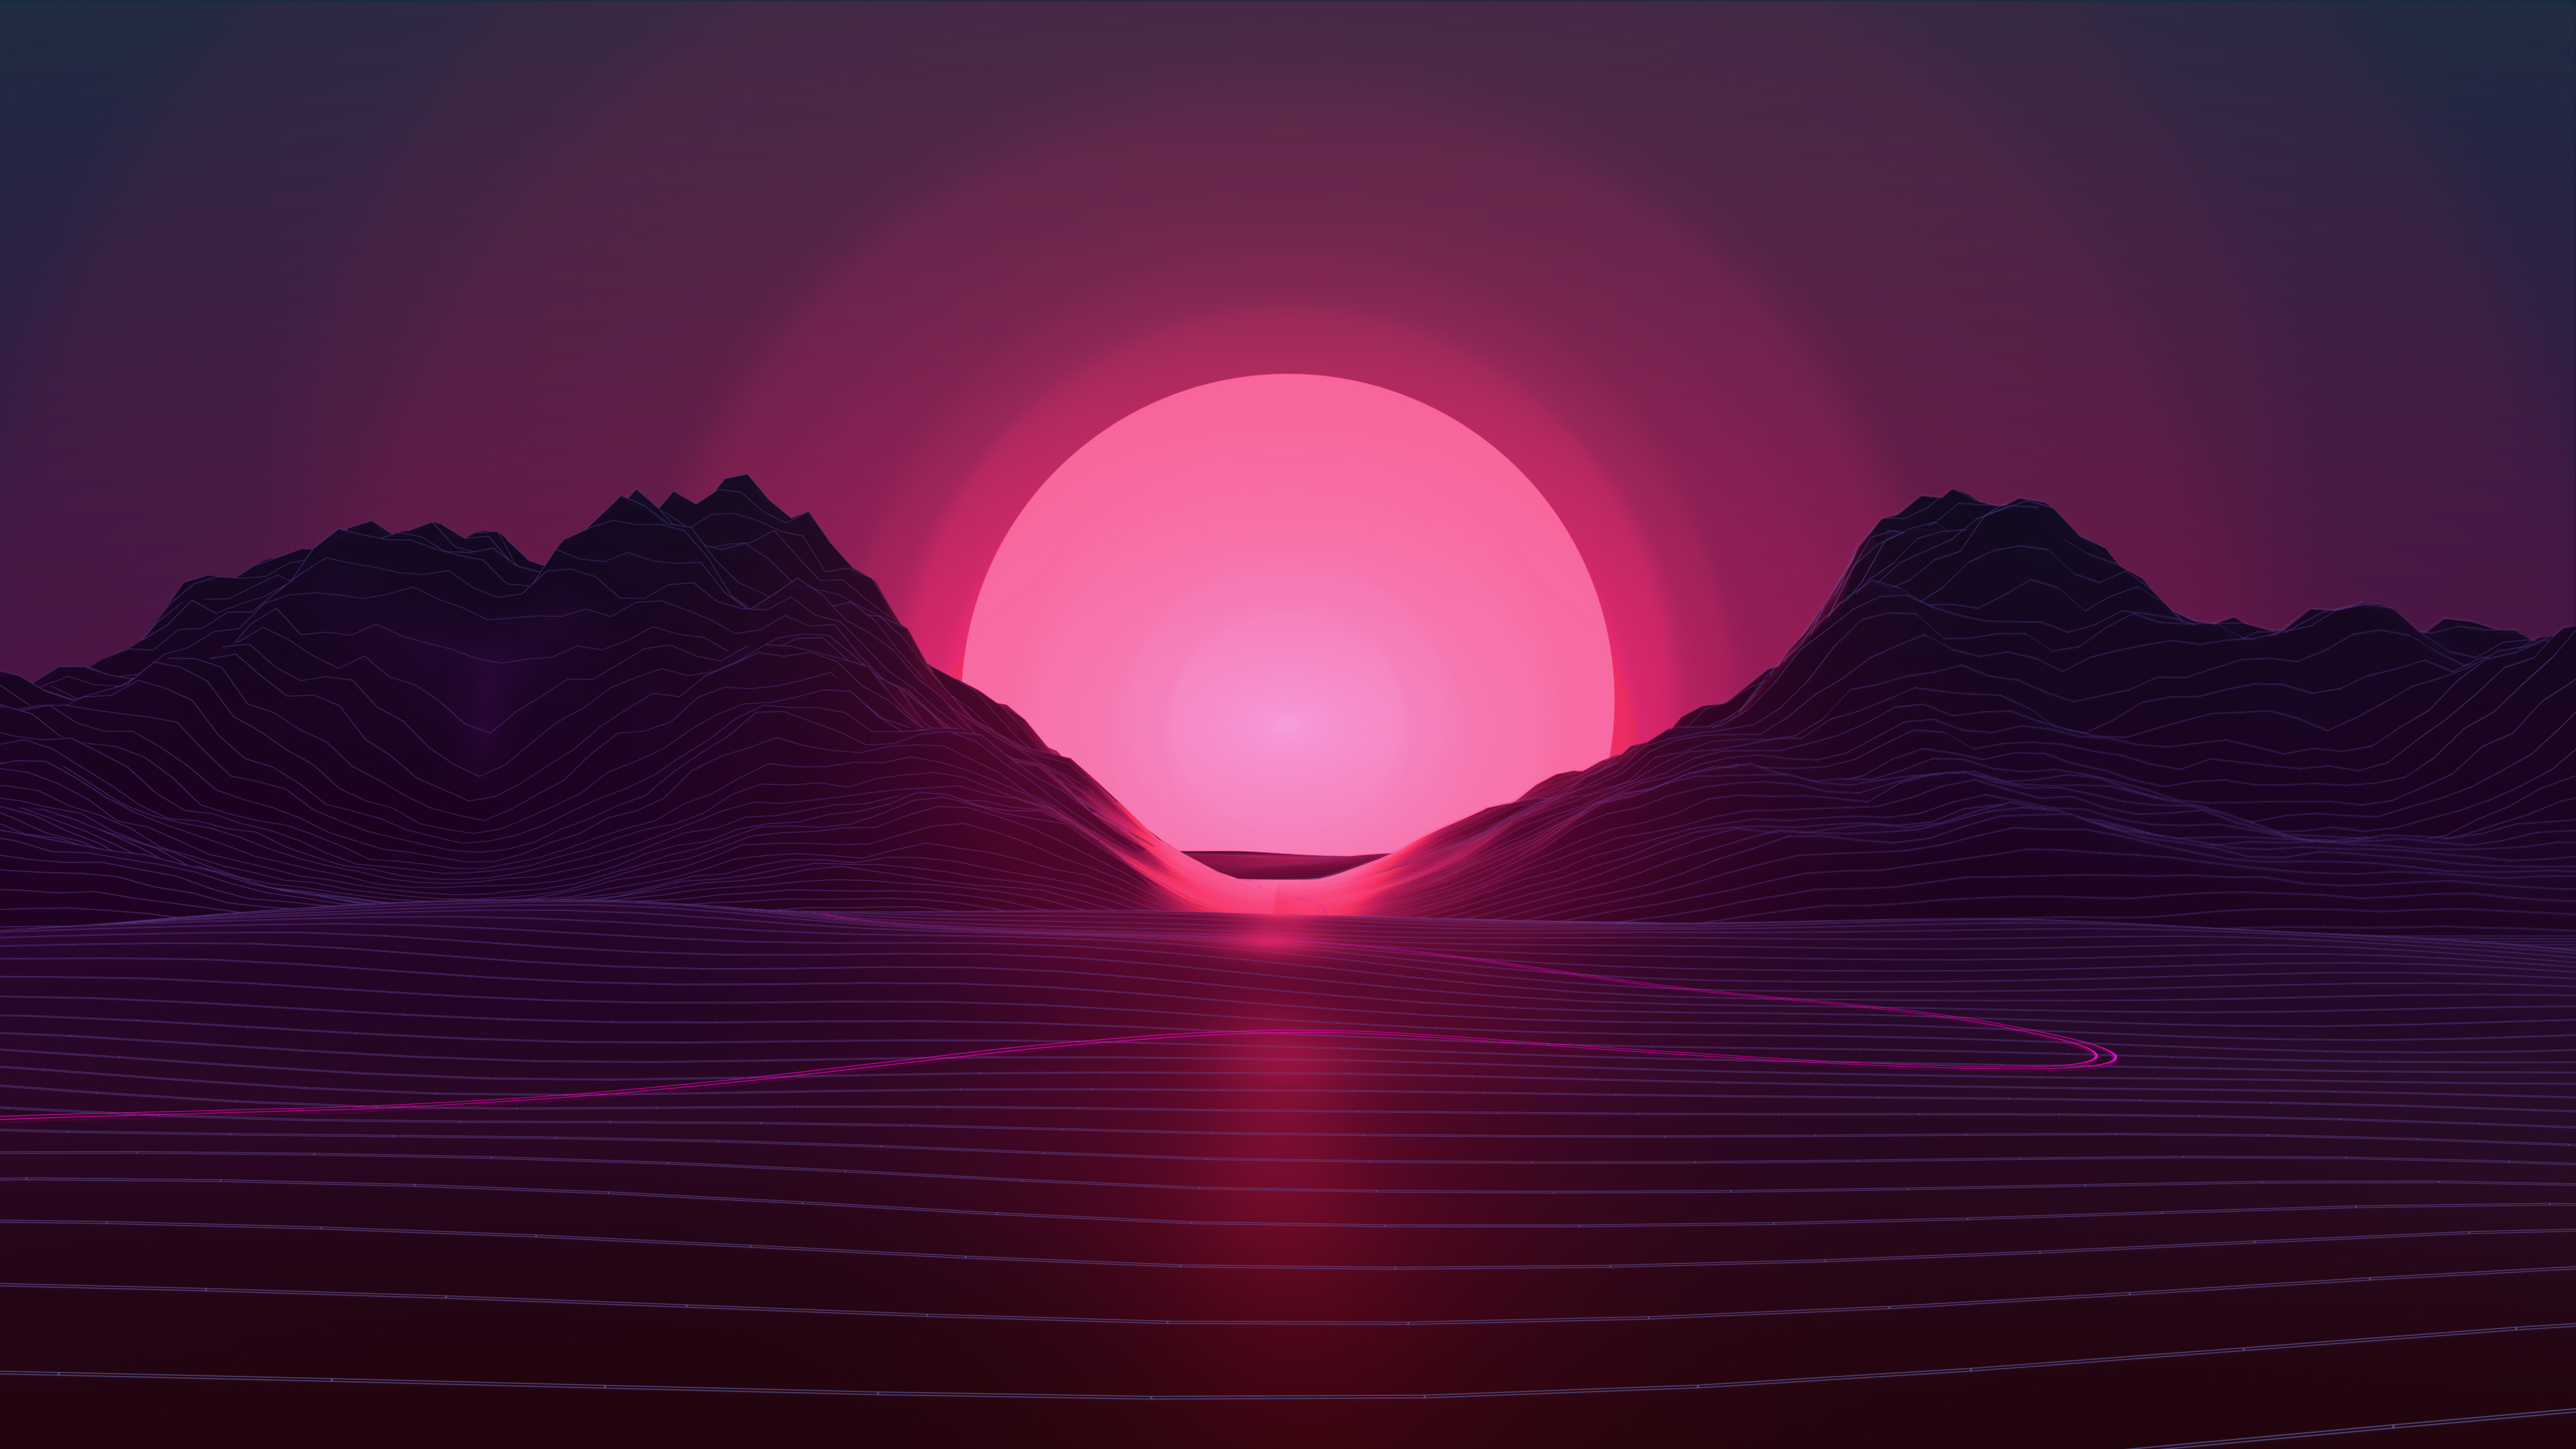 Sun In Retro Wave Mountains  Hd 4k Wallpaper